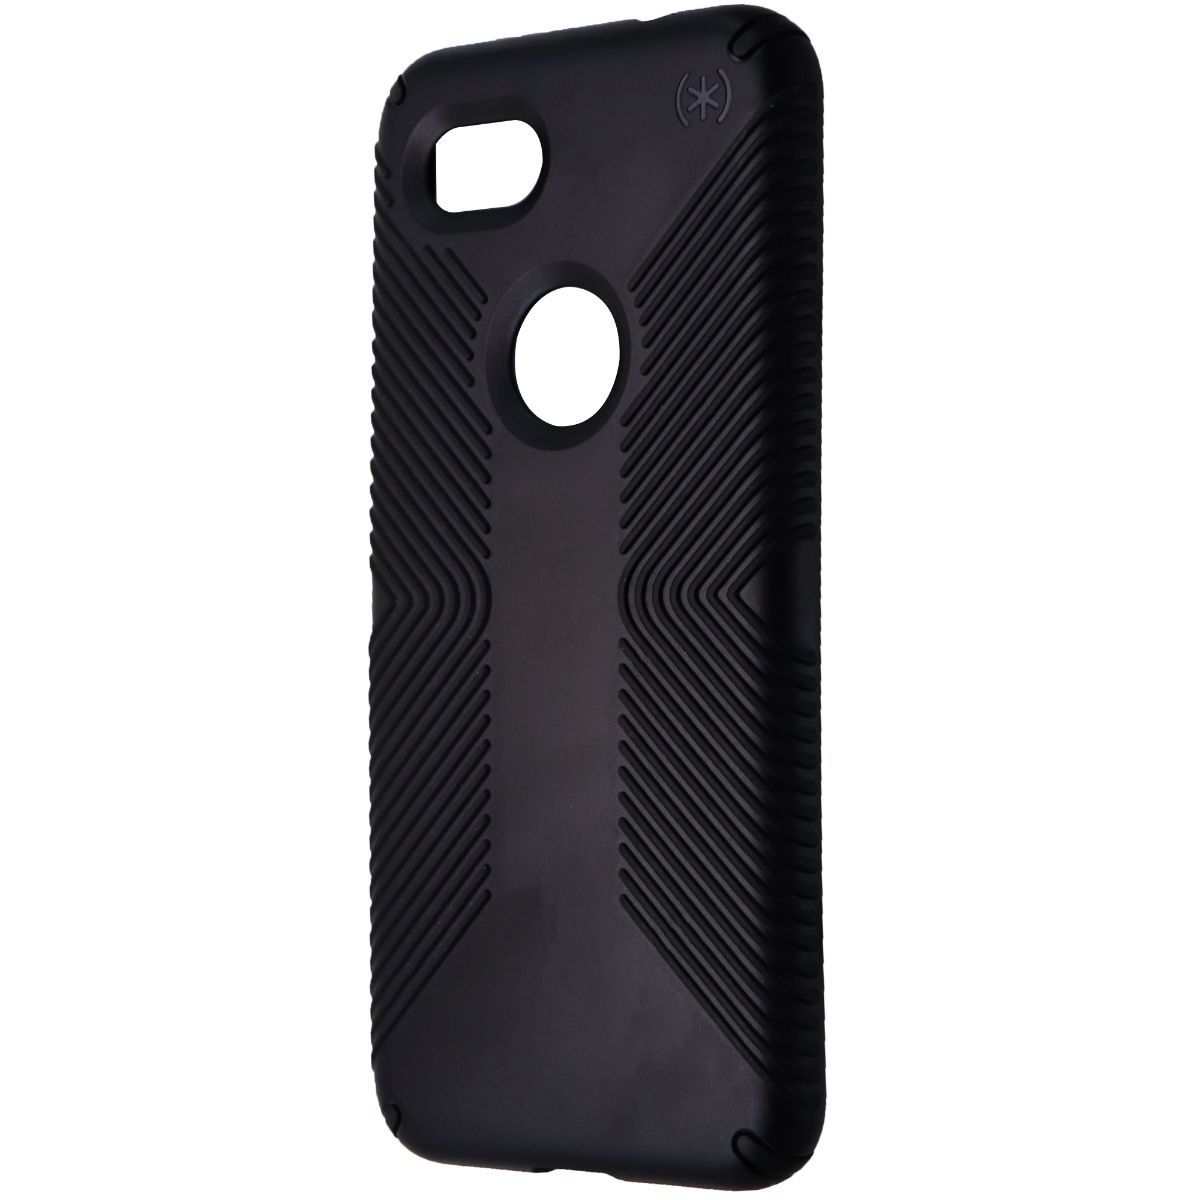 Speck Presidio Grip Case for Google Pixel 3a - Black/Black